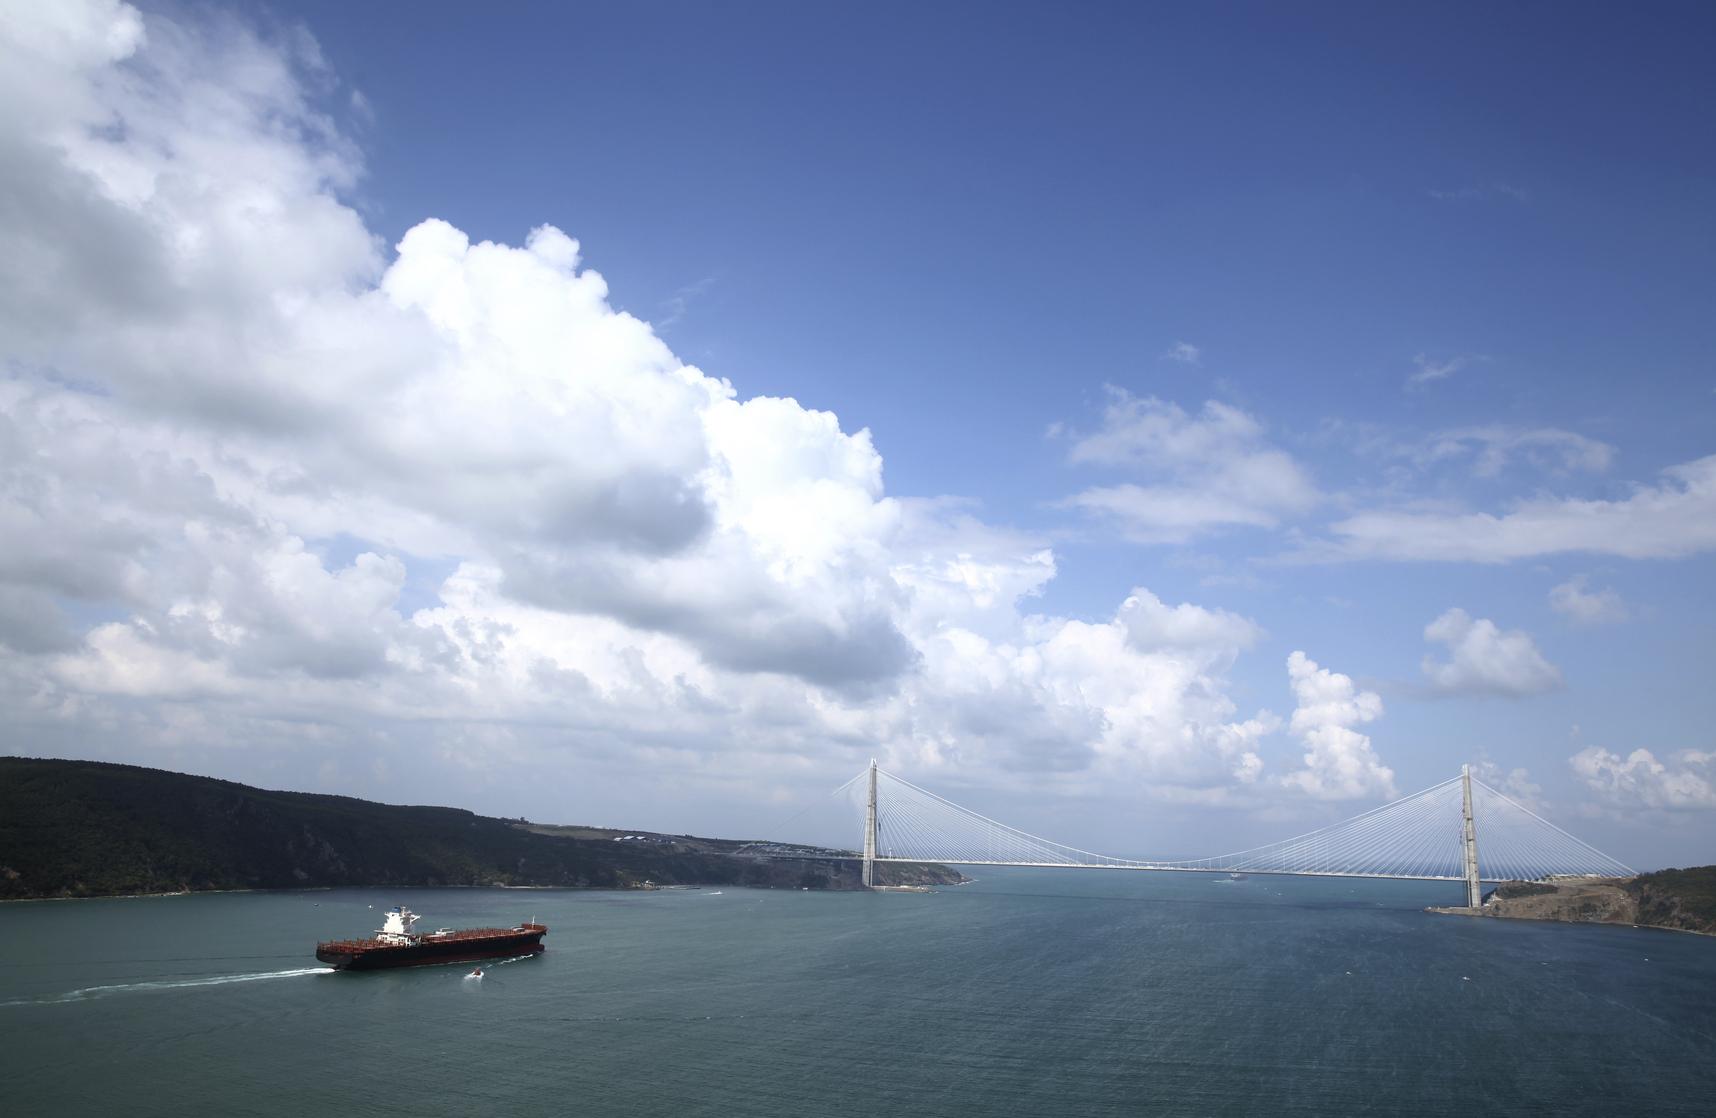 Istanbul's third bridge over Bosporus  - Yavuz Sultan Selim Bridge